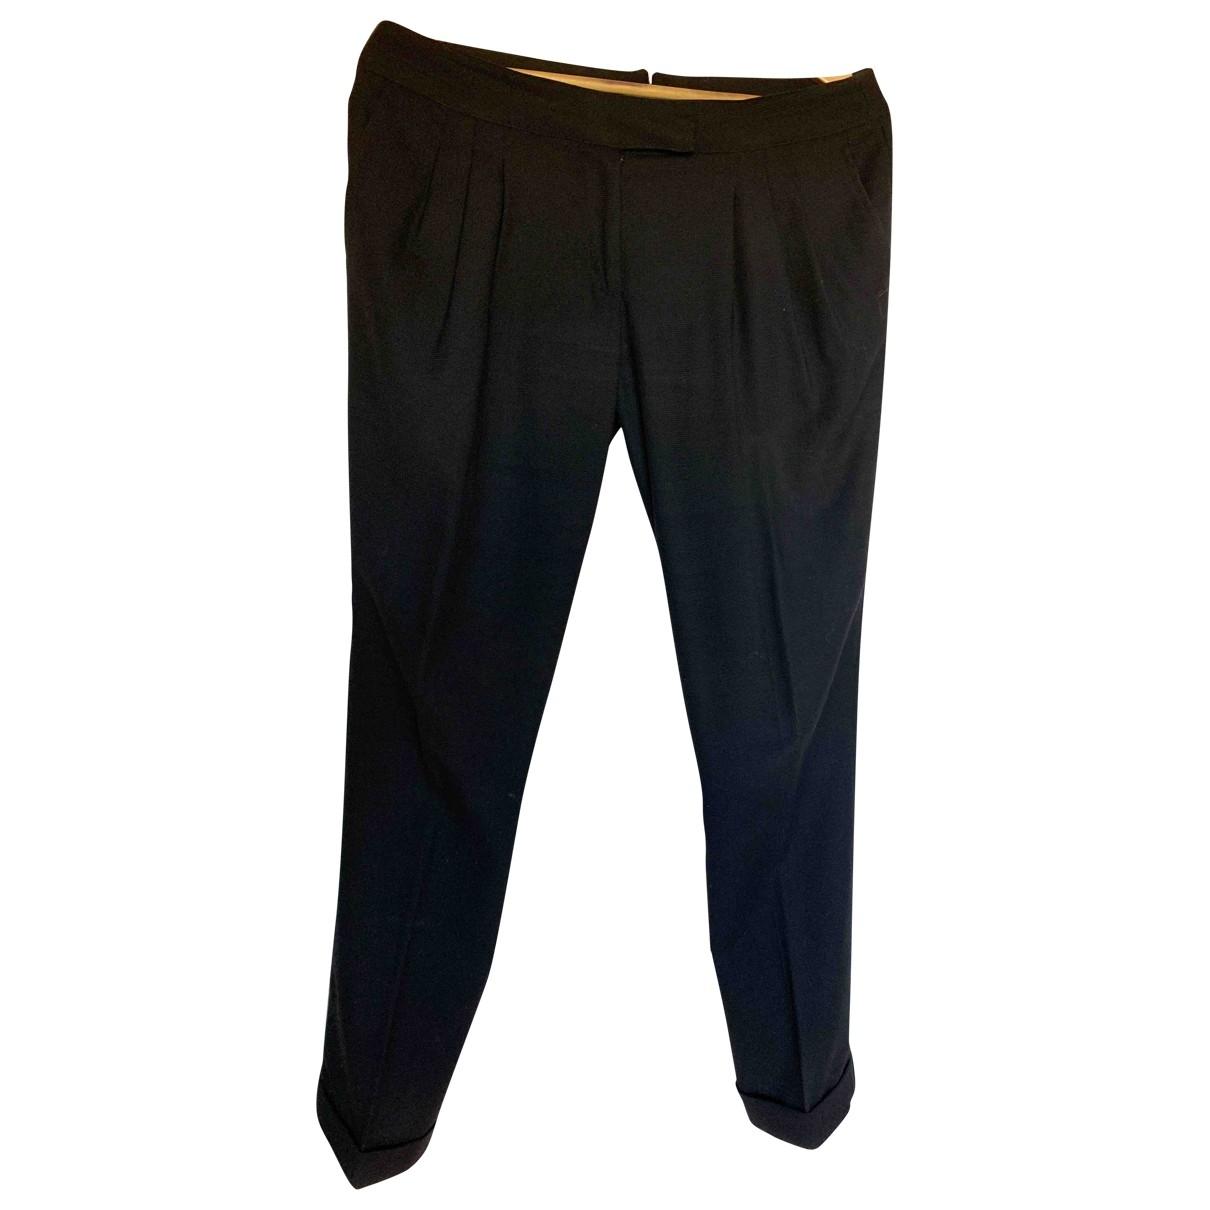 Hoss Intropia \N Black Cotton Trousers for Women 40 IT